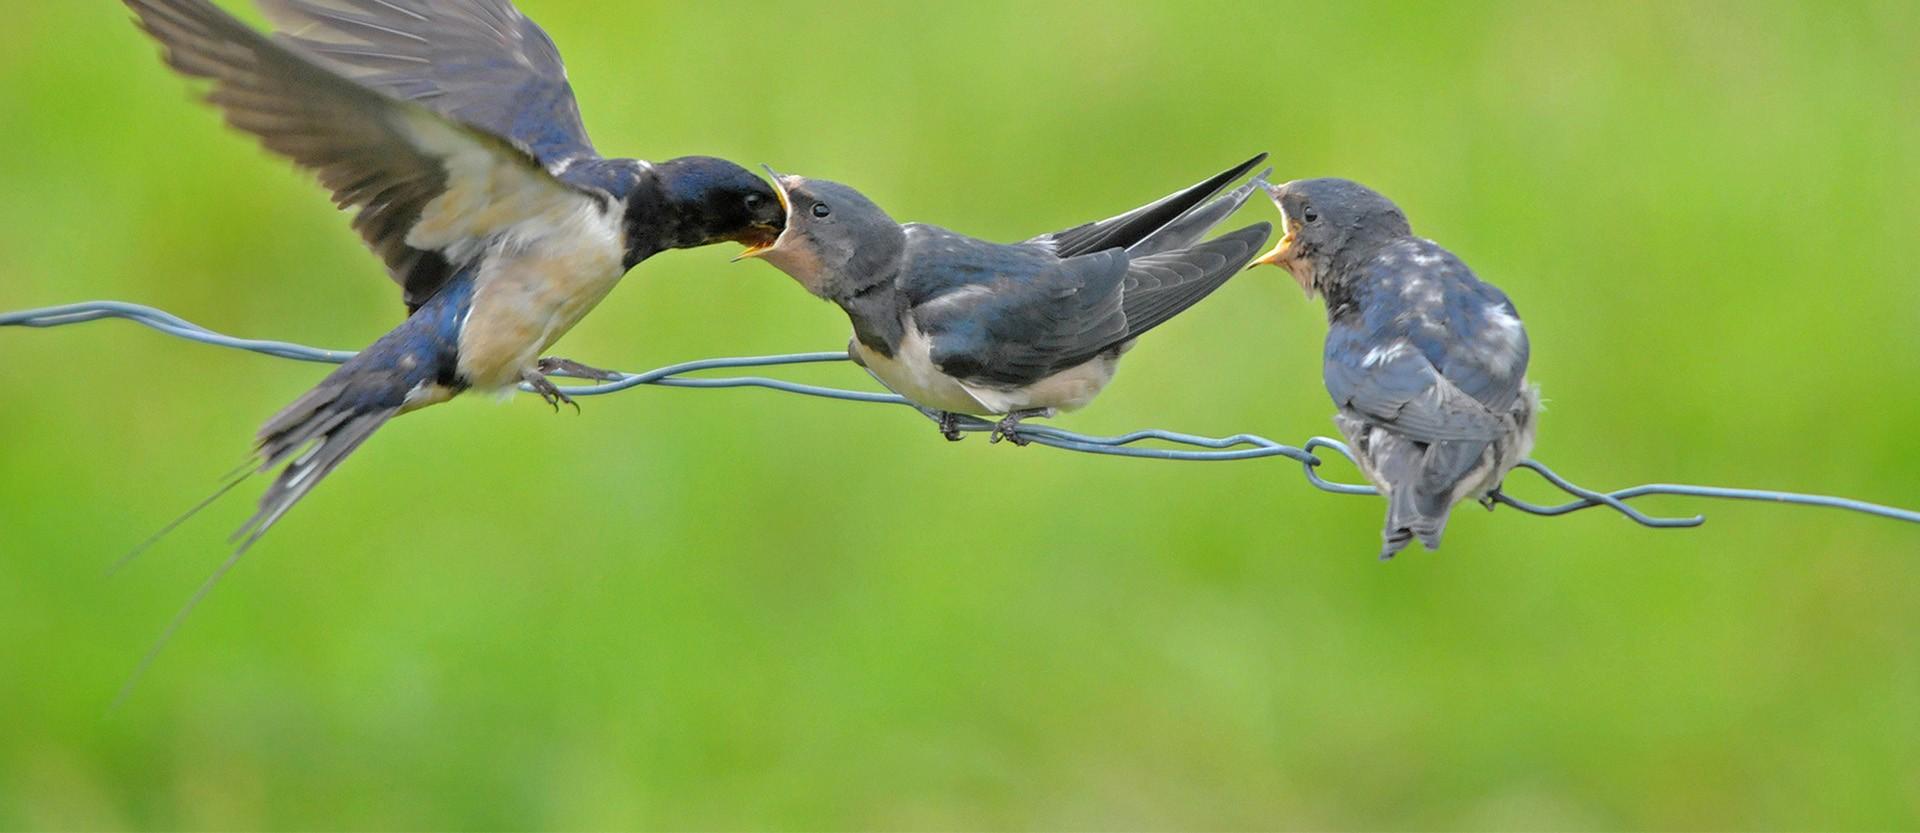 Natuurbeschermingsorganisatie It Fryske Gea